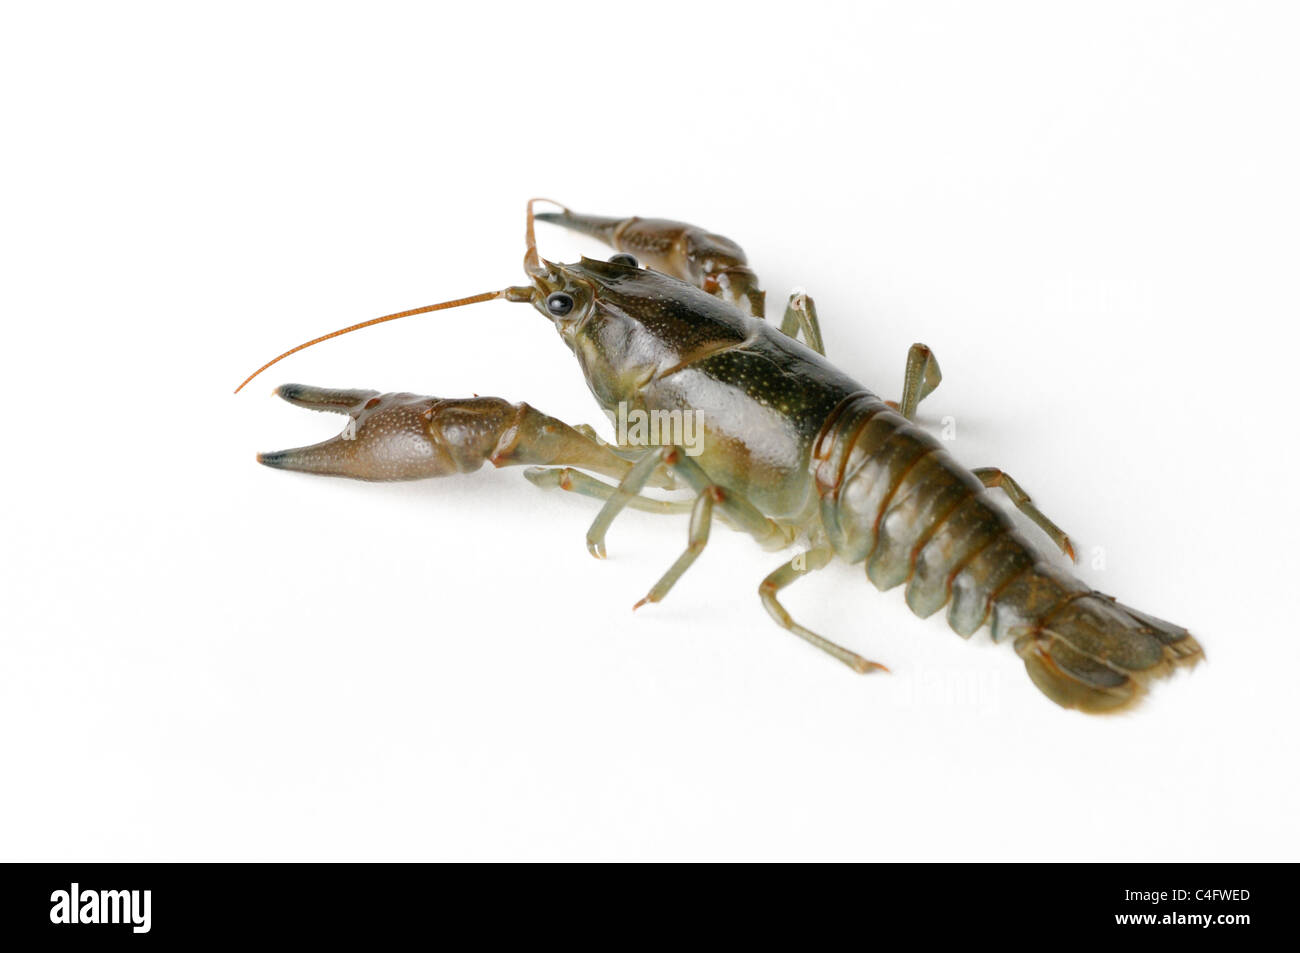 Cambarid crayfish - Stock Image